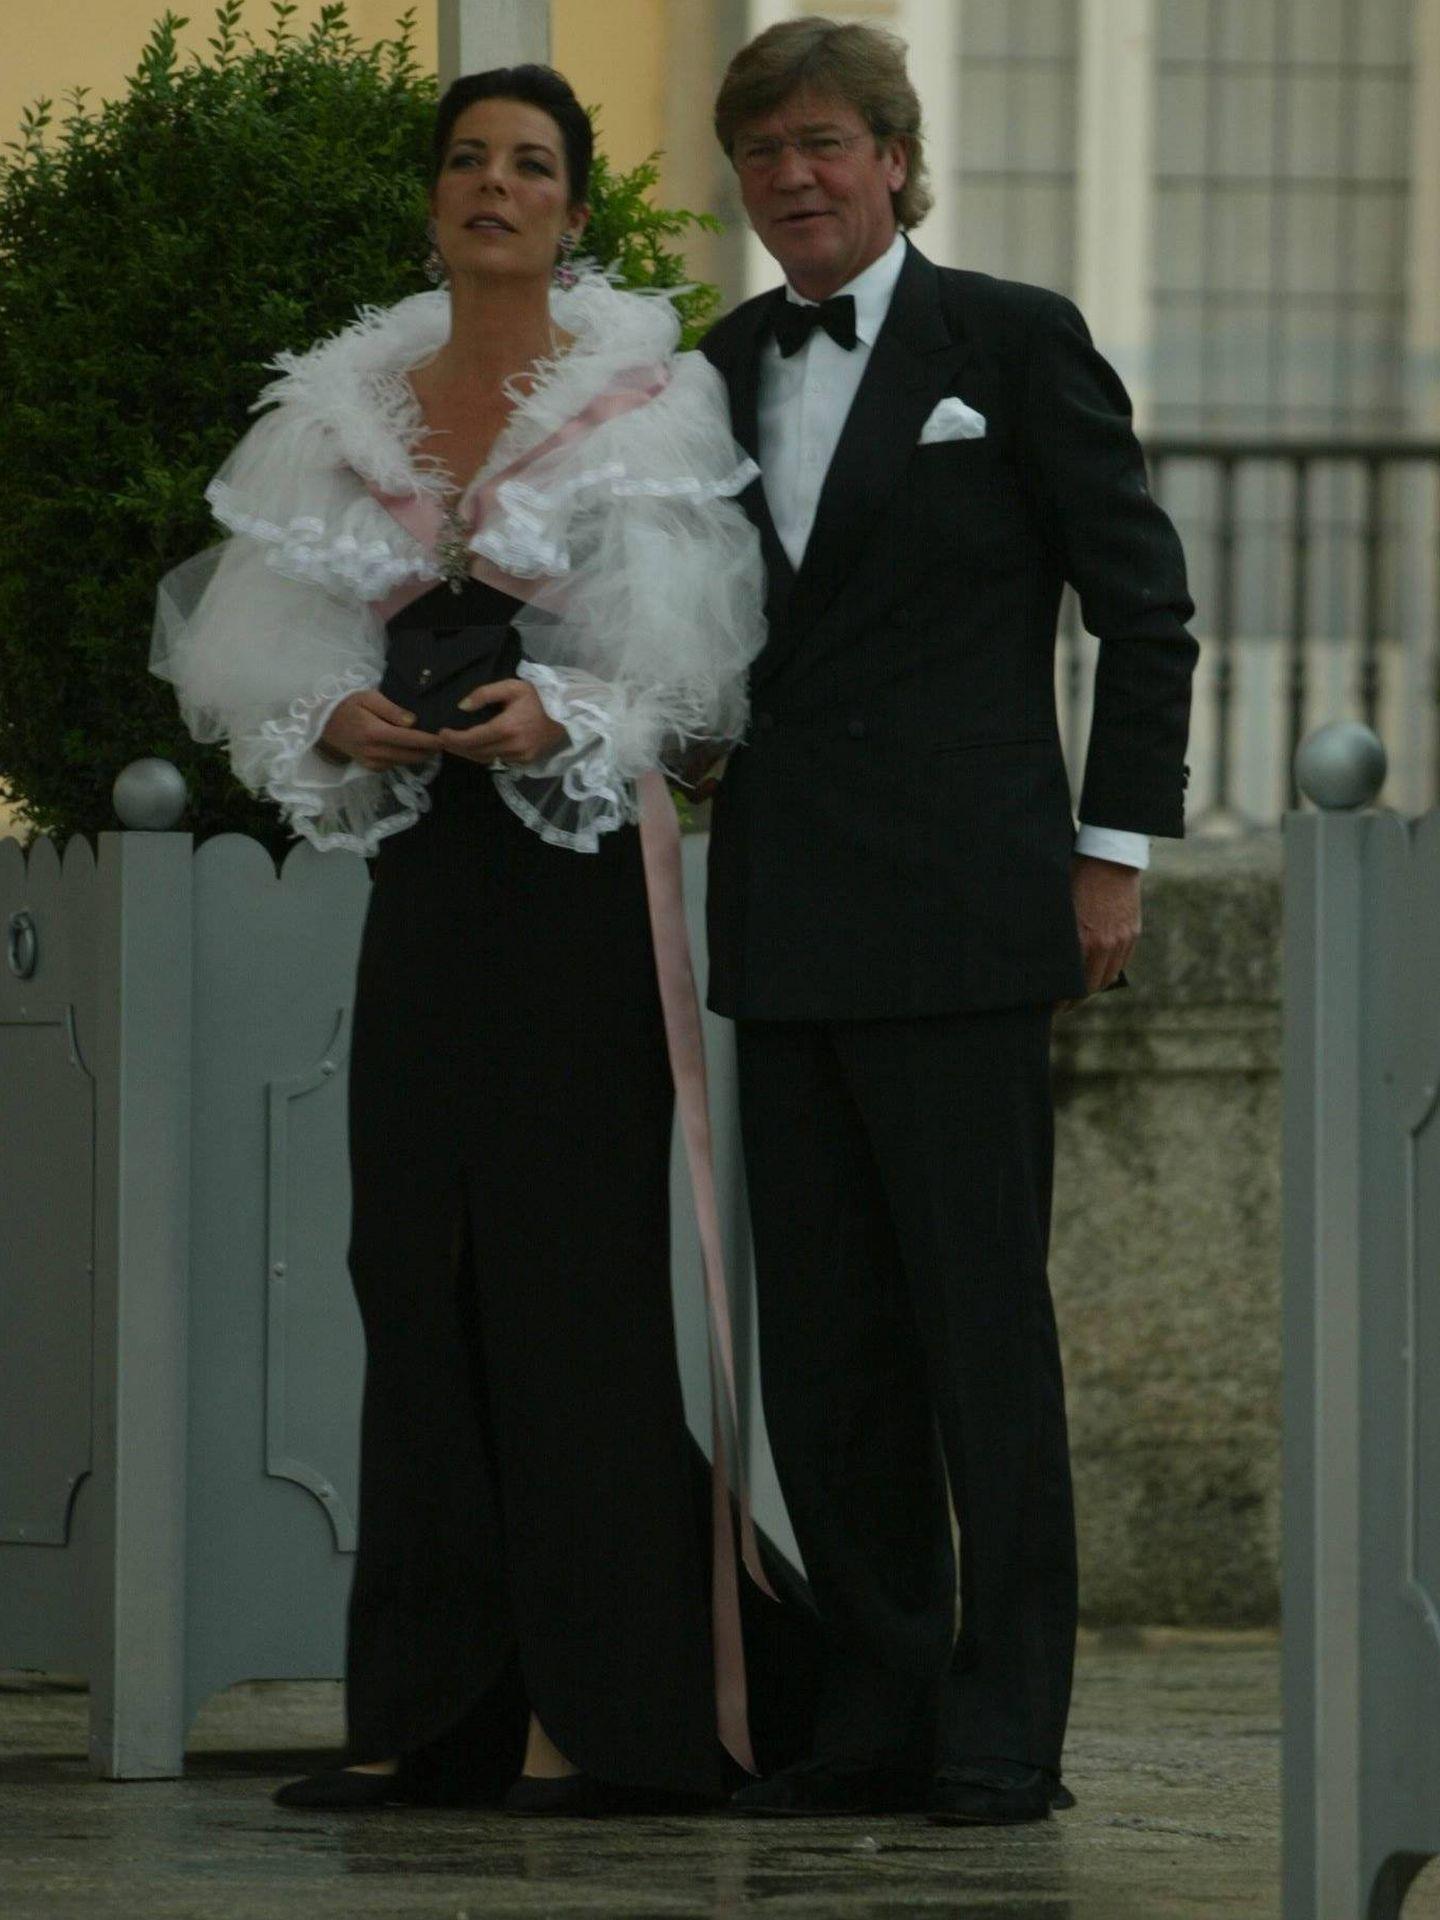 Carolina de Mónaco con su marido, Ernesto de Hannover. (CP)